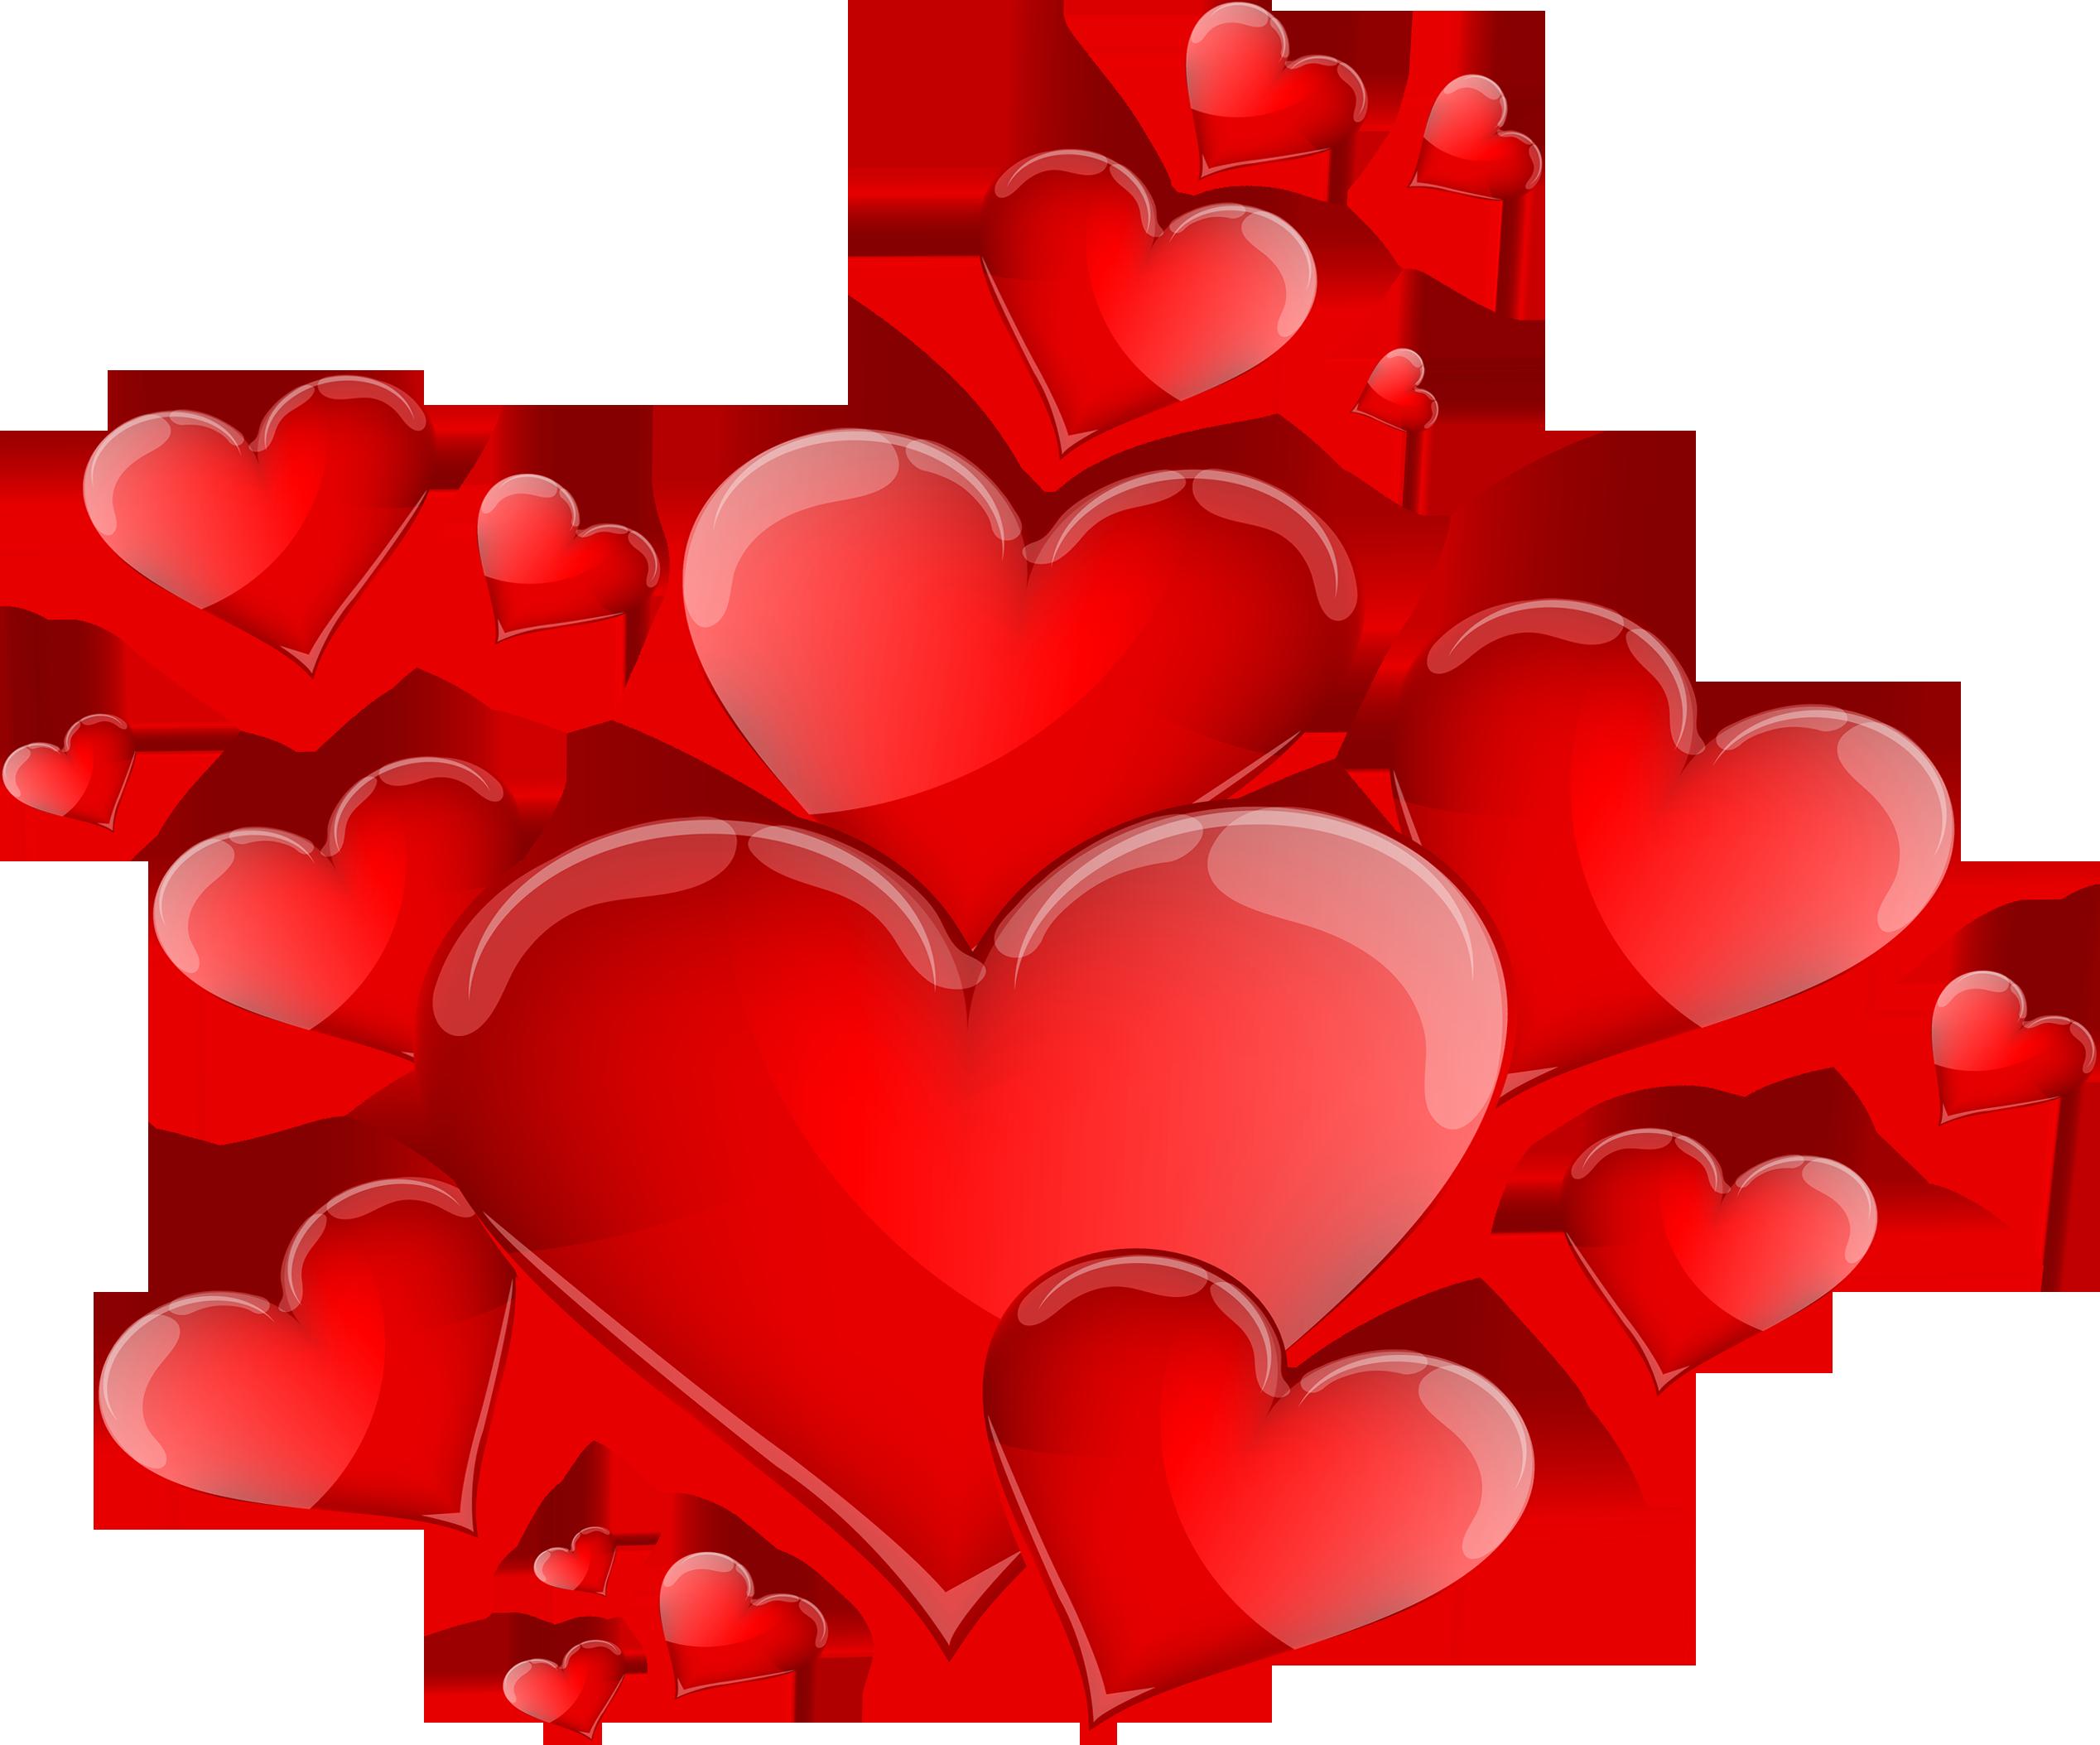 Pin De Veronica Avila En Serdechki Emojis De Amor Emoji De Beso Imagenes De Emojis